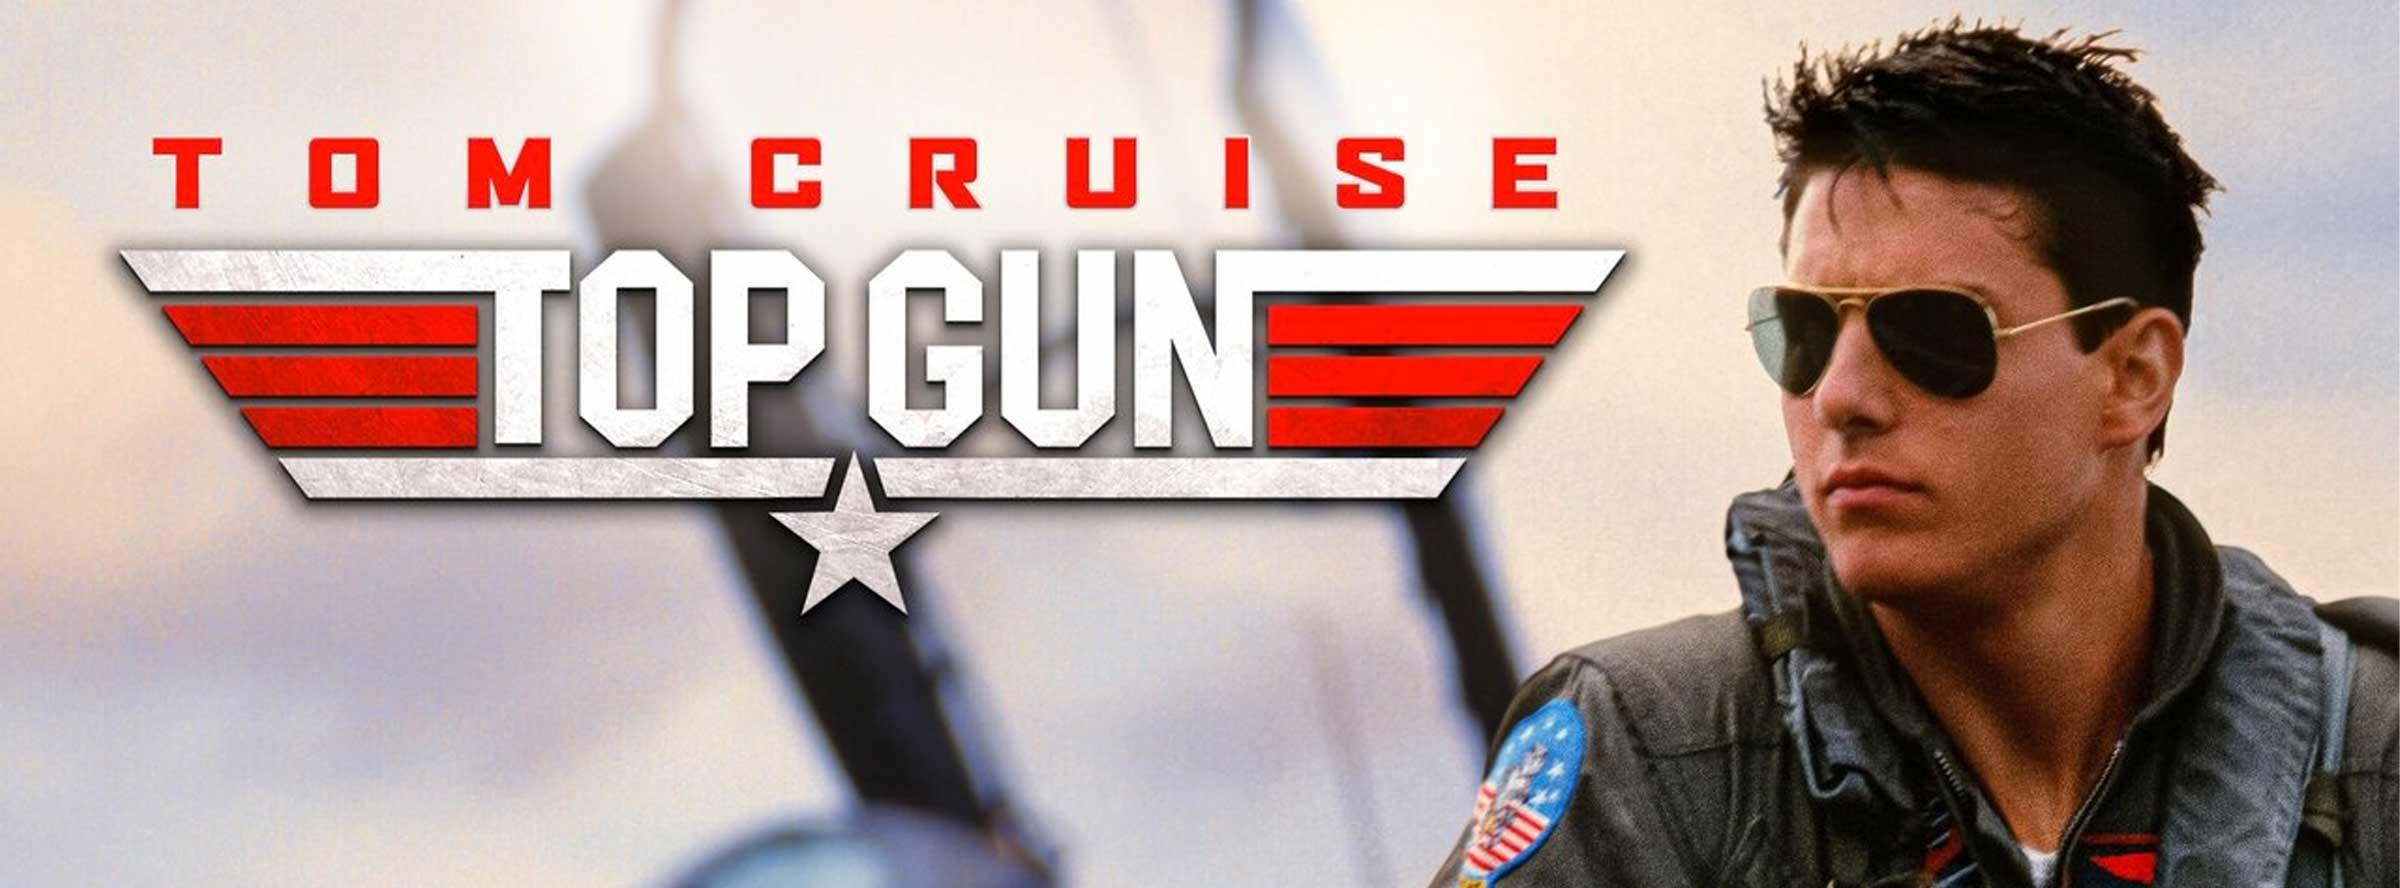 Slider Image for Top Gun (1986)